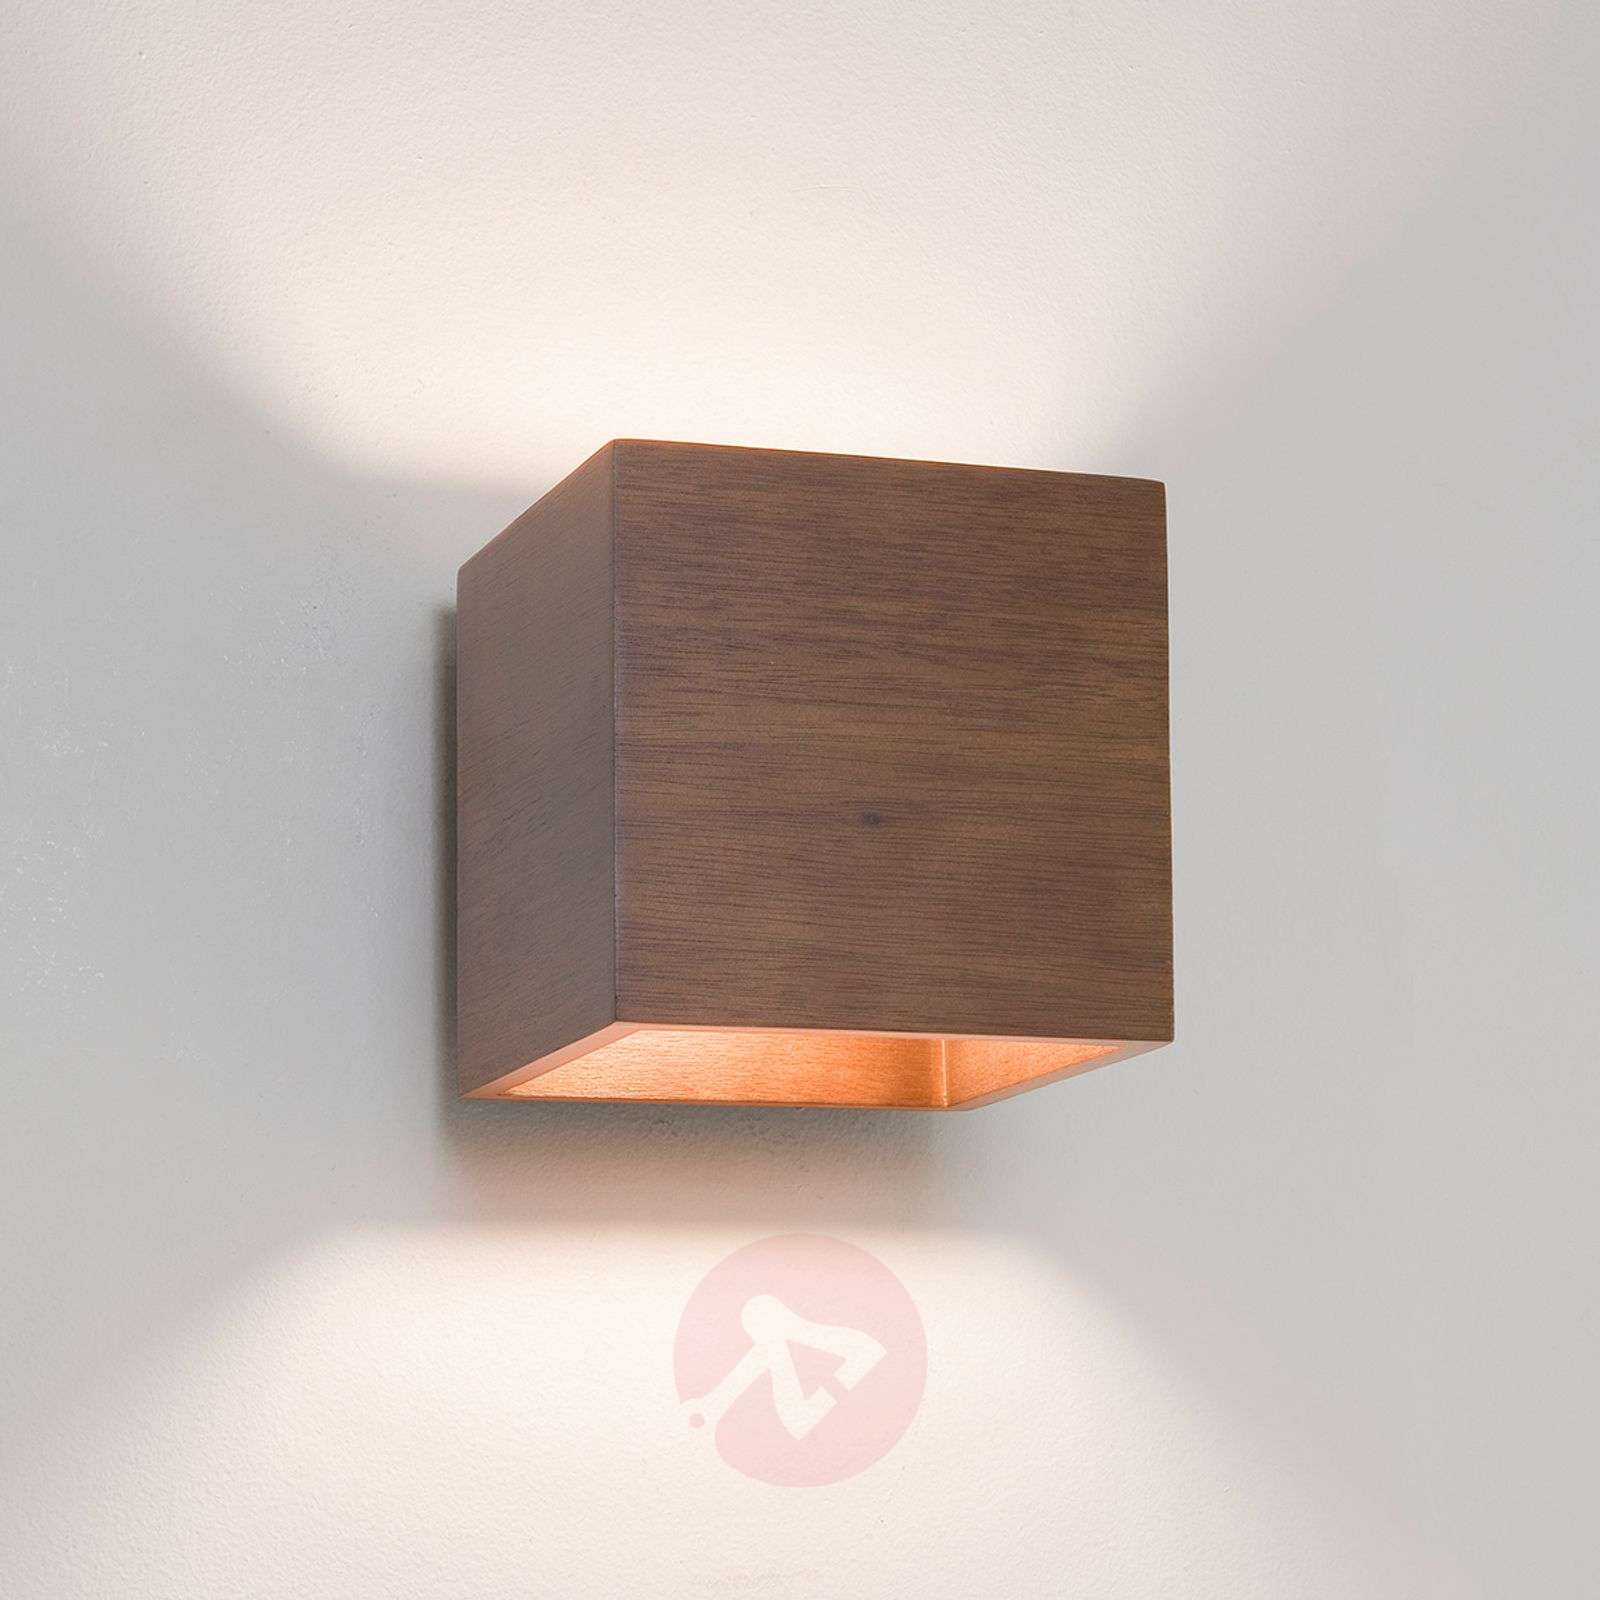 Cremona Wall Light Beautiful Wooden-1020241-03